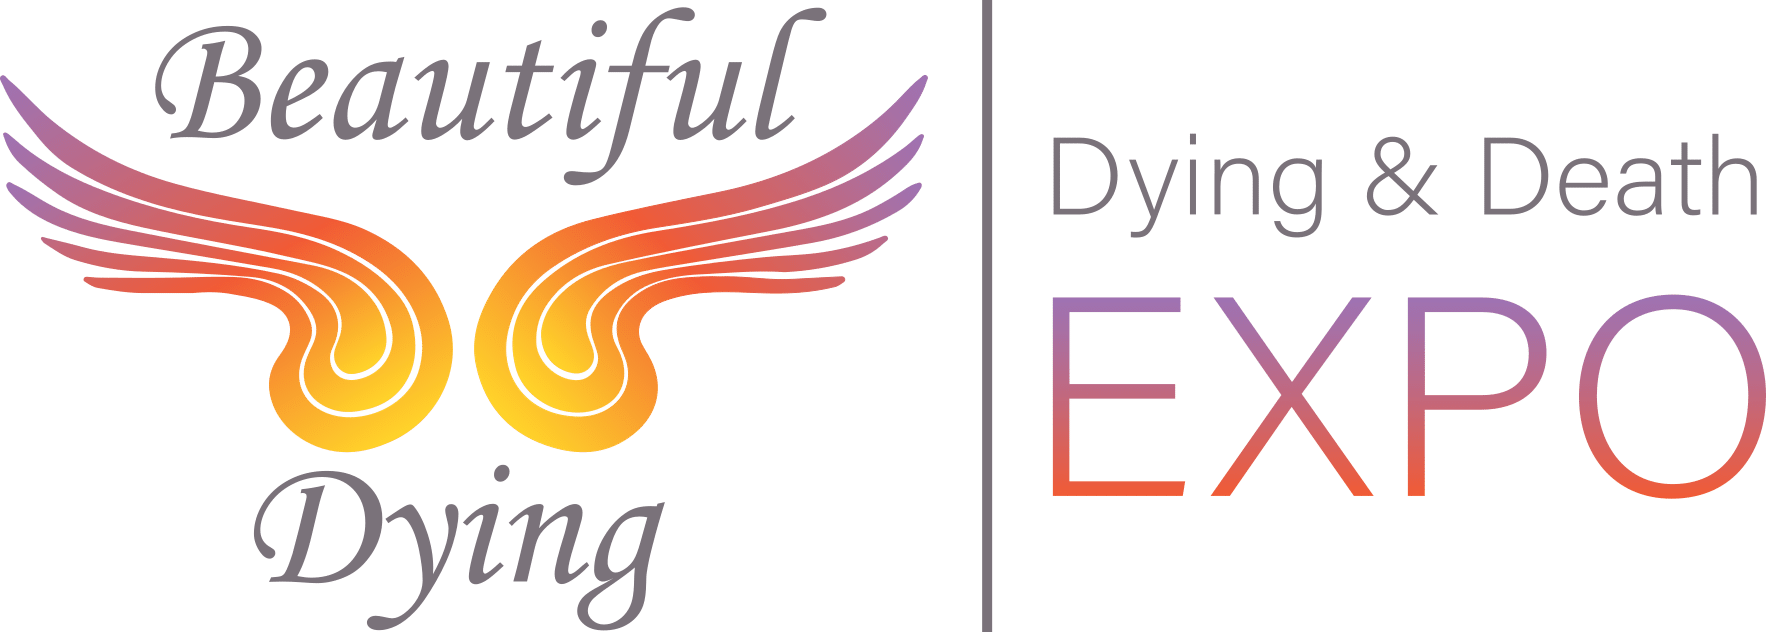 Beautiful Dying Expo Logo 08142021